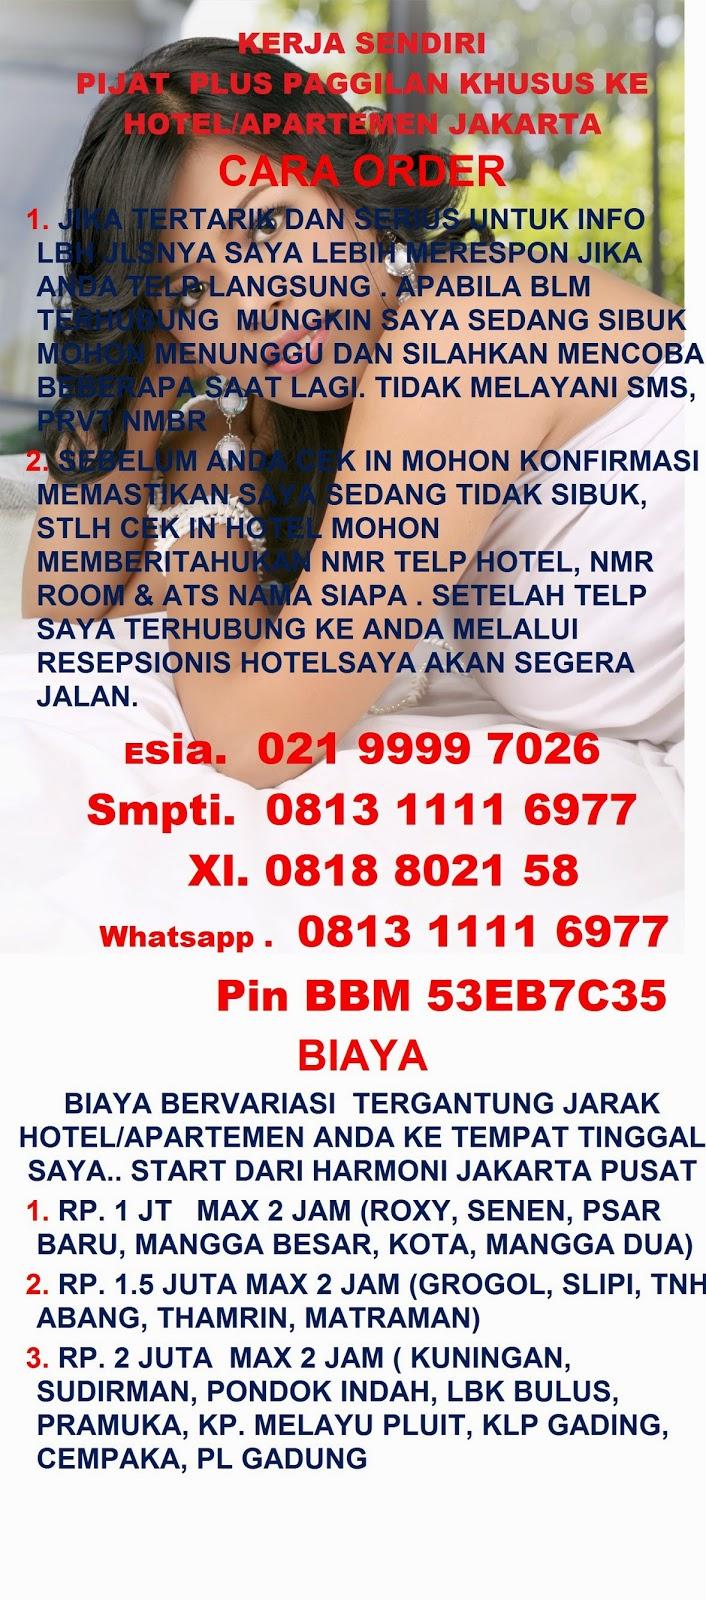 Bandung Undercover: Panti Pijat Plus di Bandung